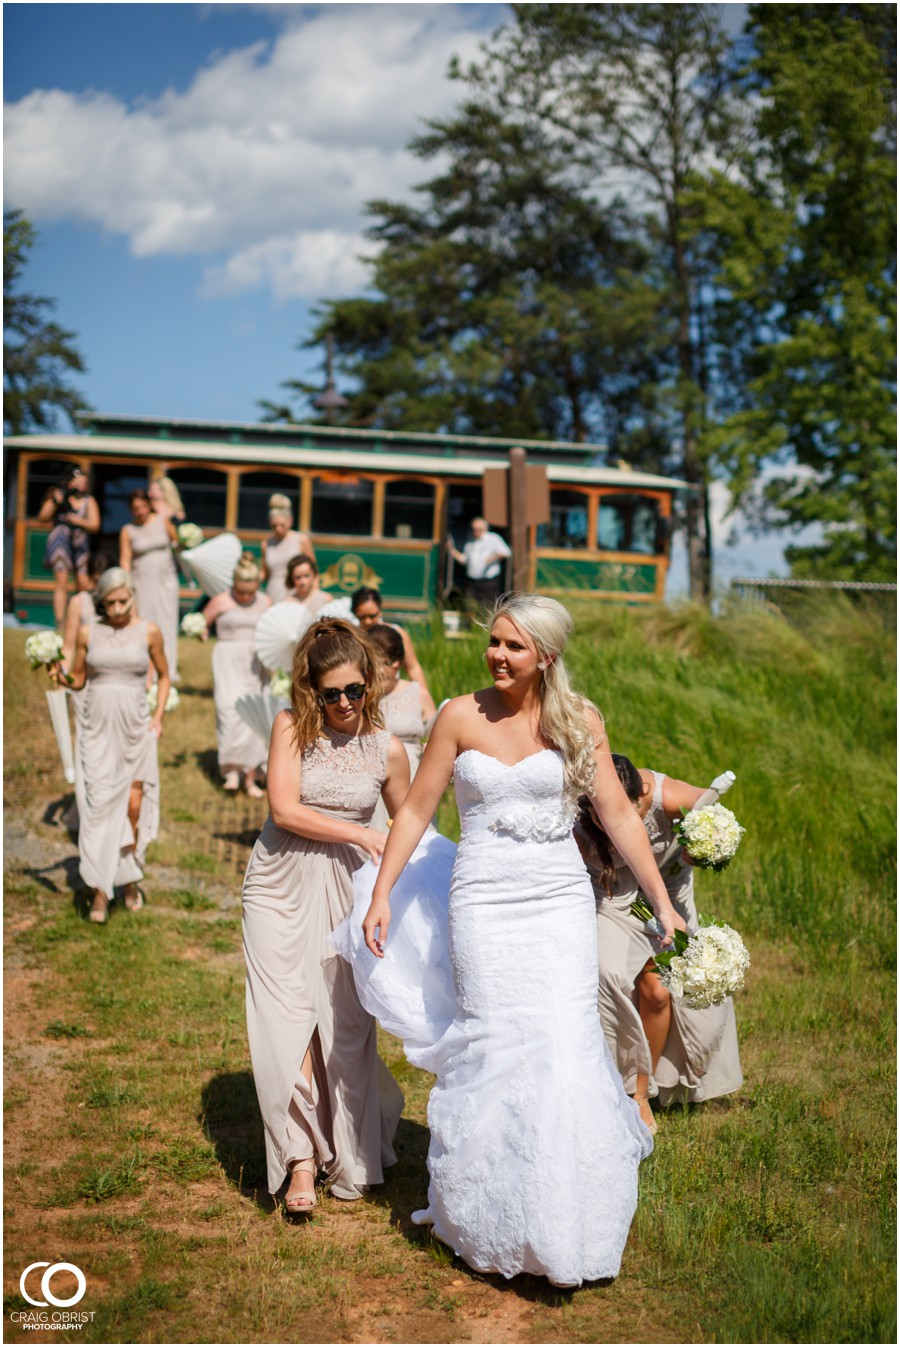 Lake-Lanier-Islands-Wedding-Golf-Course-Atlanta-Portraits_0024.jpg